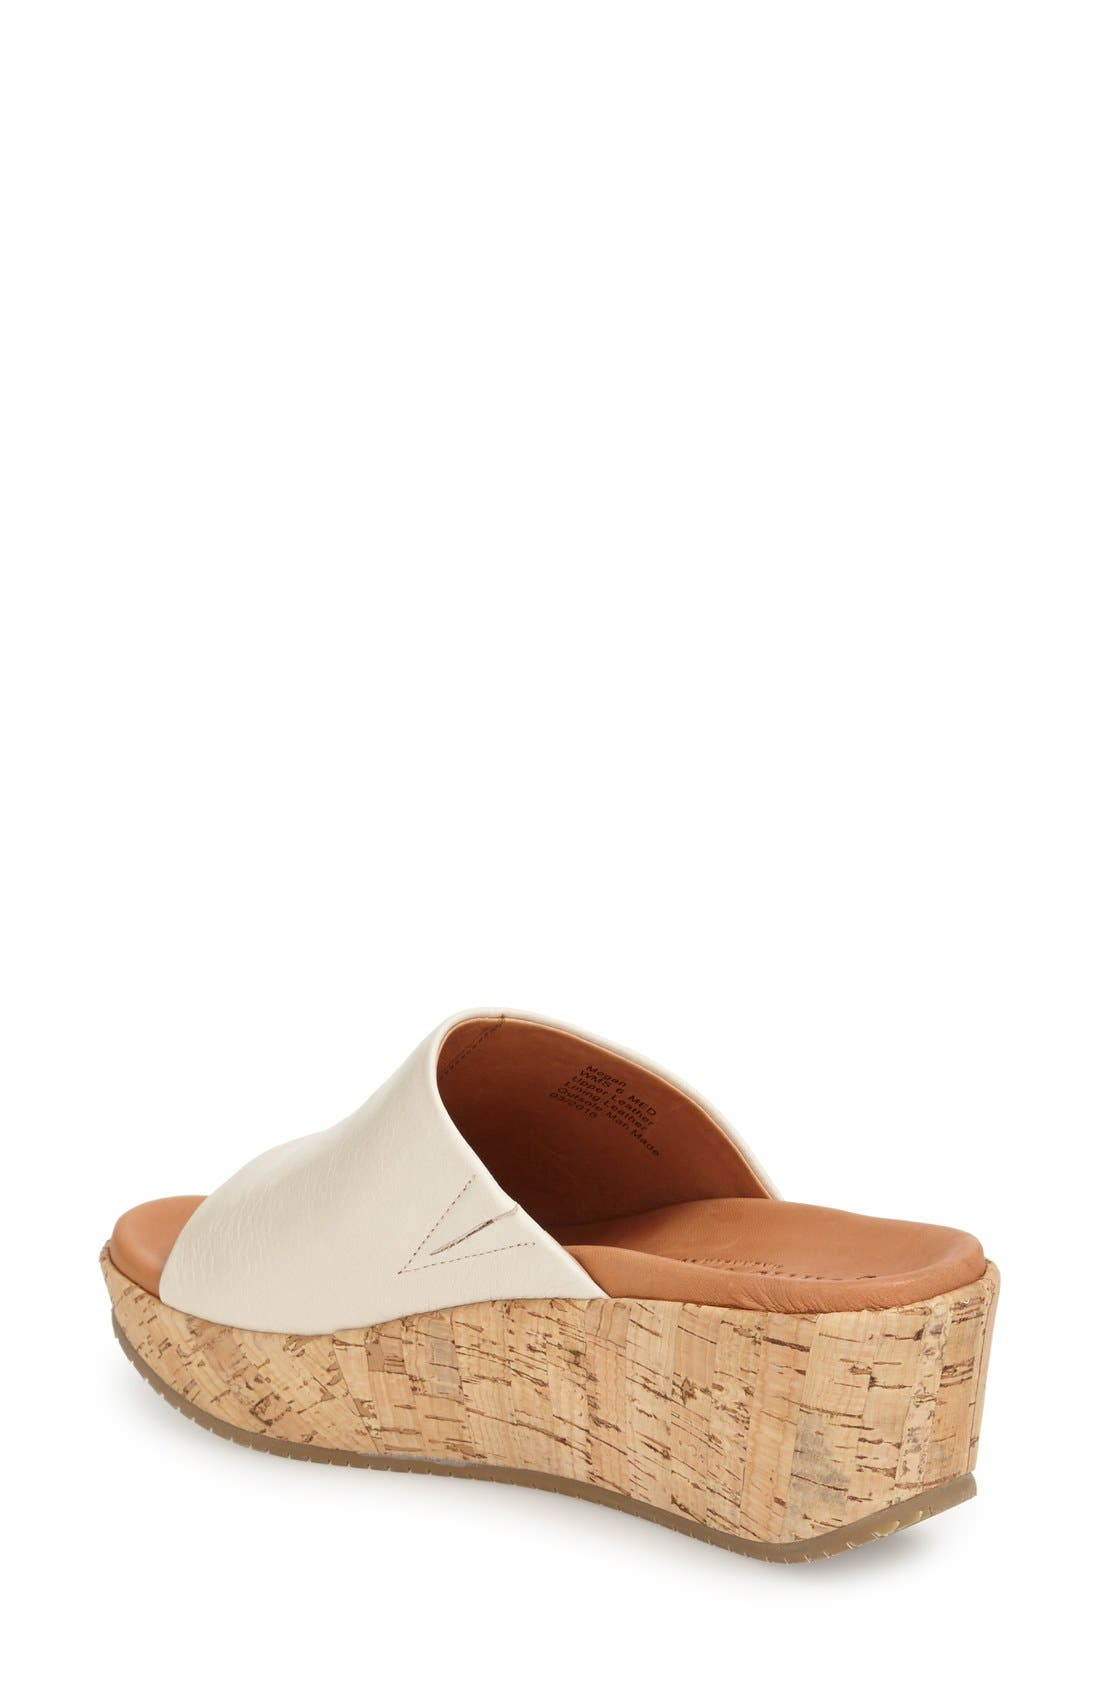 'Megan' Platform Wedge Sandal,                             Alternate thumbnail 2, color,                             053